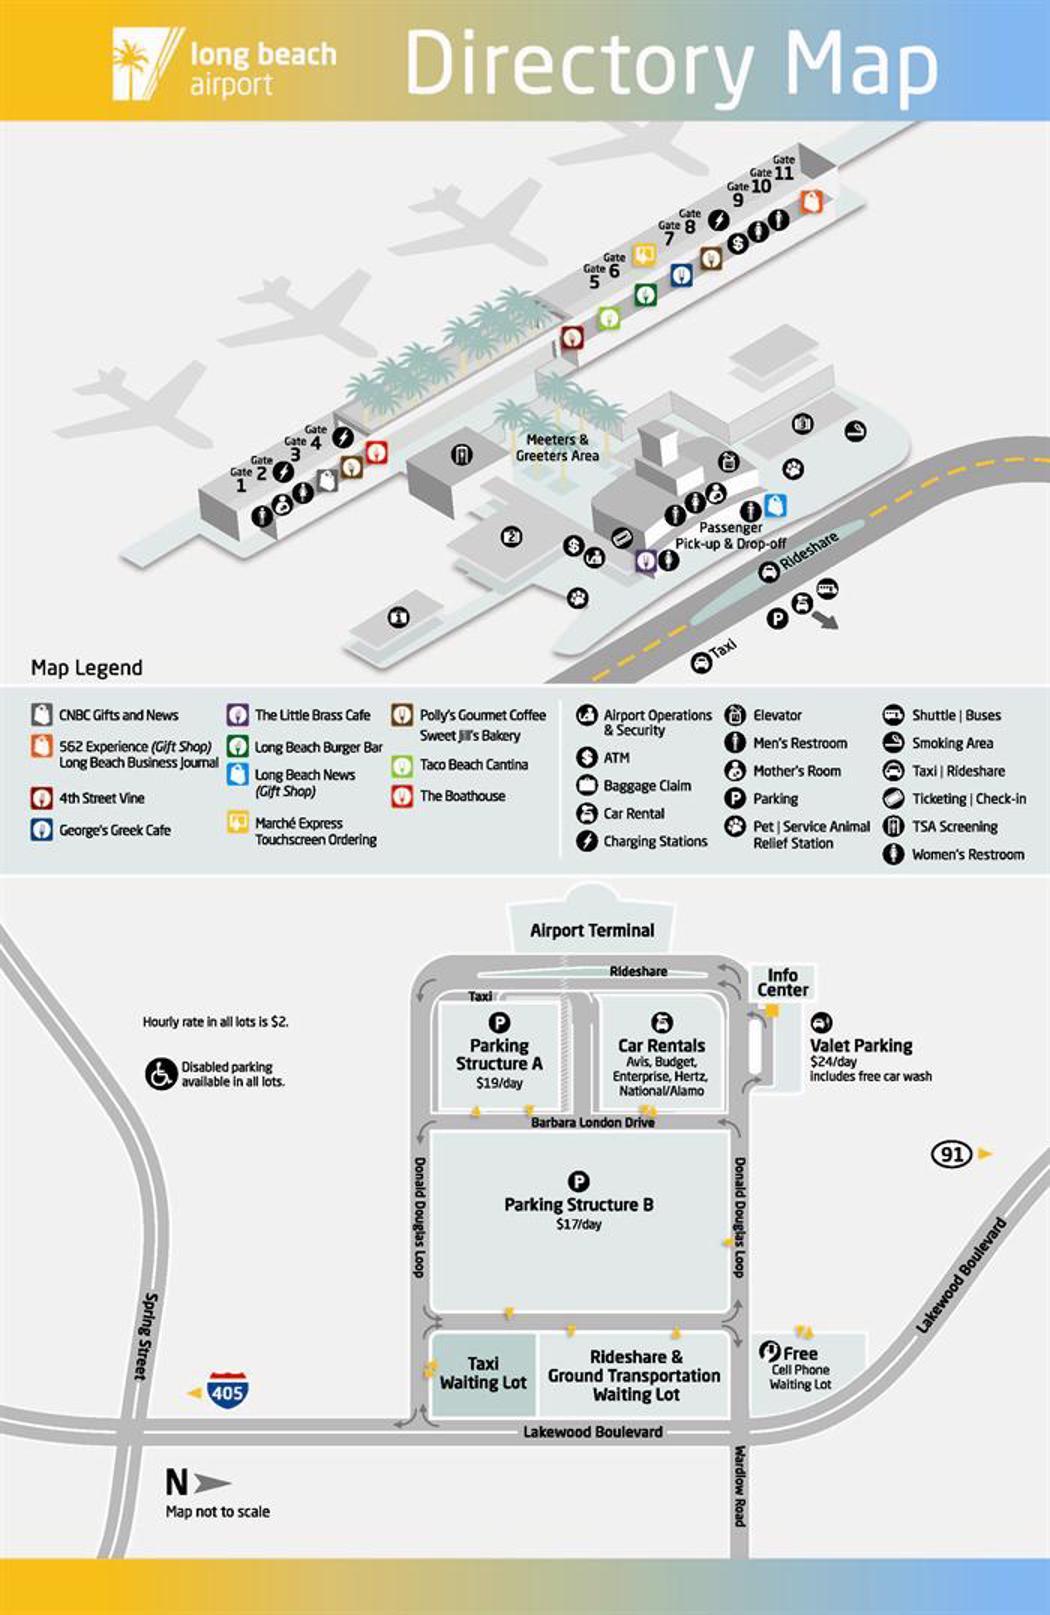 long beach airport map (lgb) - printable terminal maps